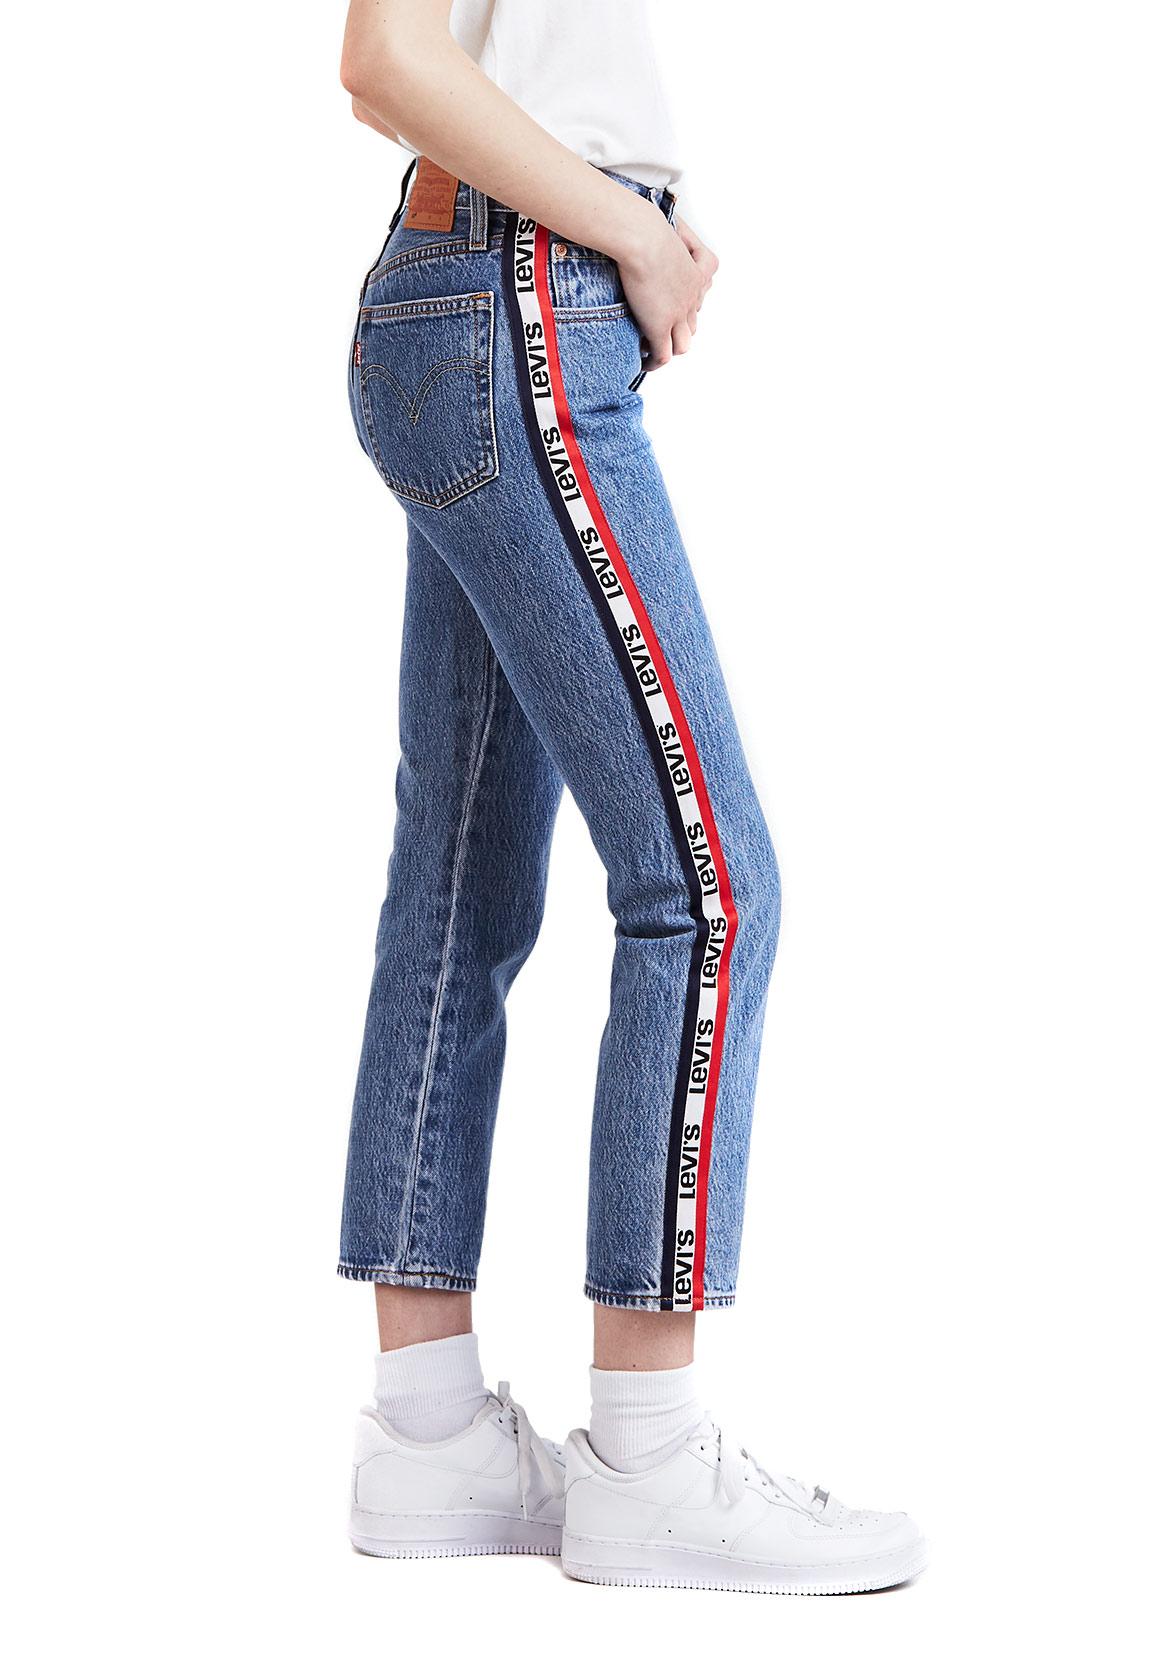 Levis Damen Crop Jeans 501 ORIGINAL 36200-0013 Blau Damen Jeans   Hosen 541ee6502c